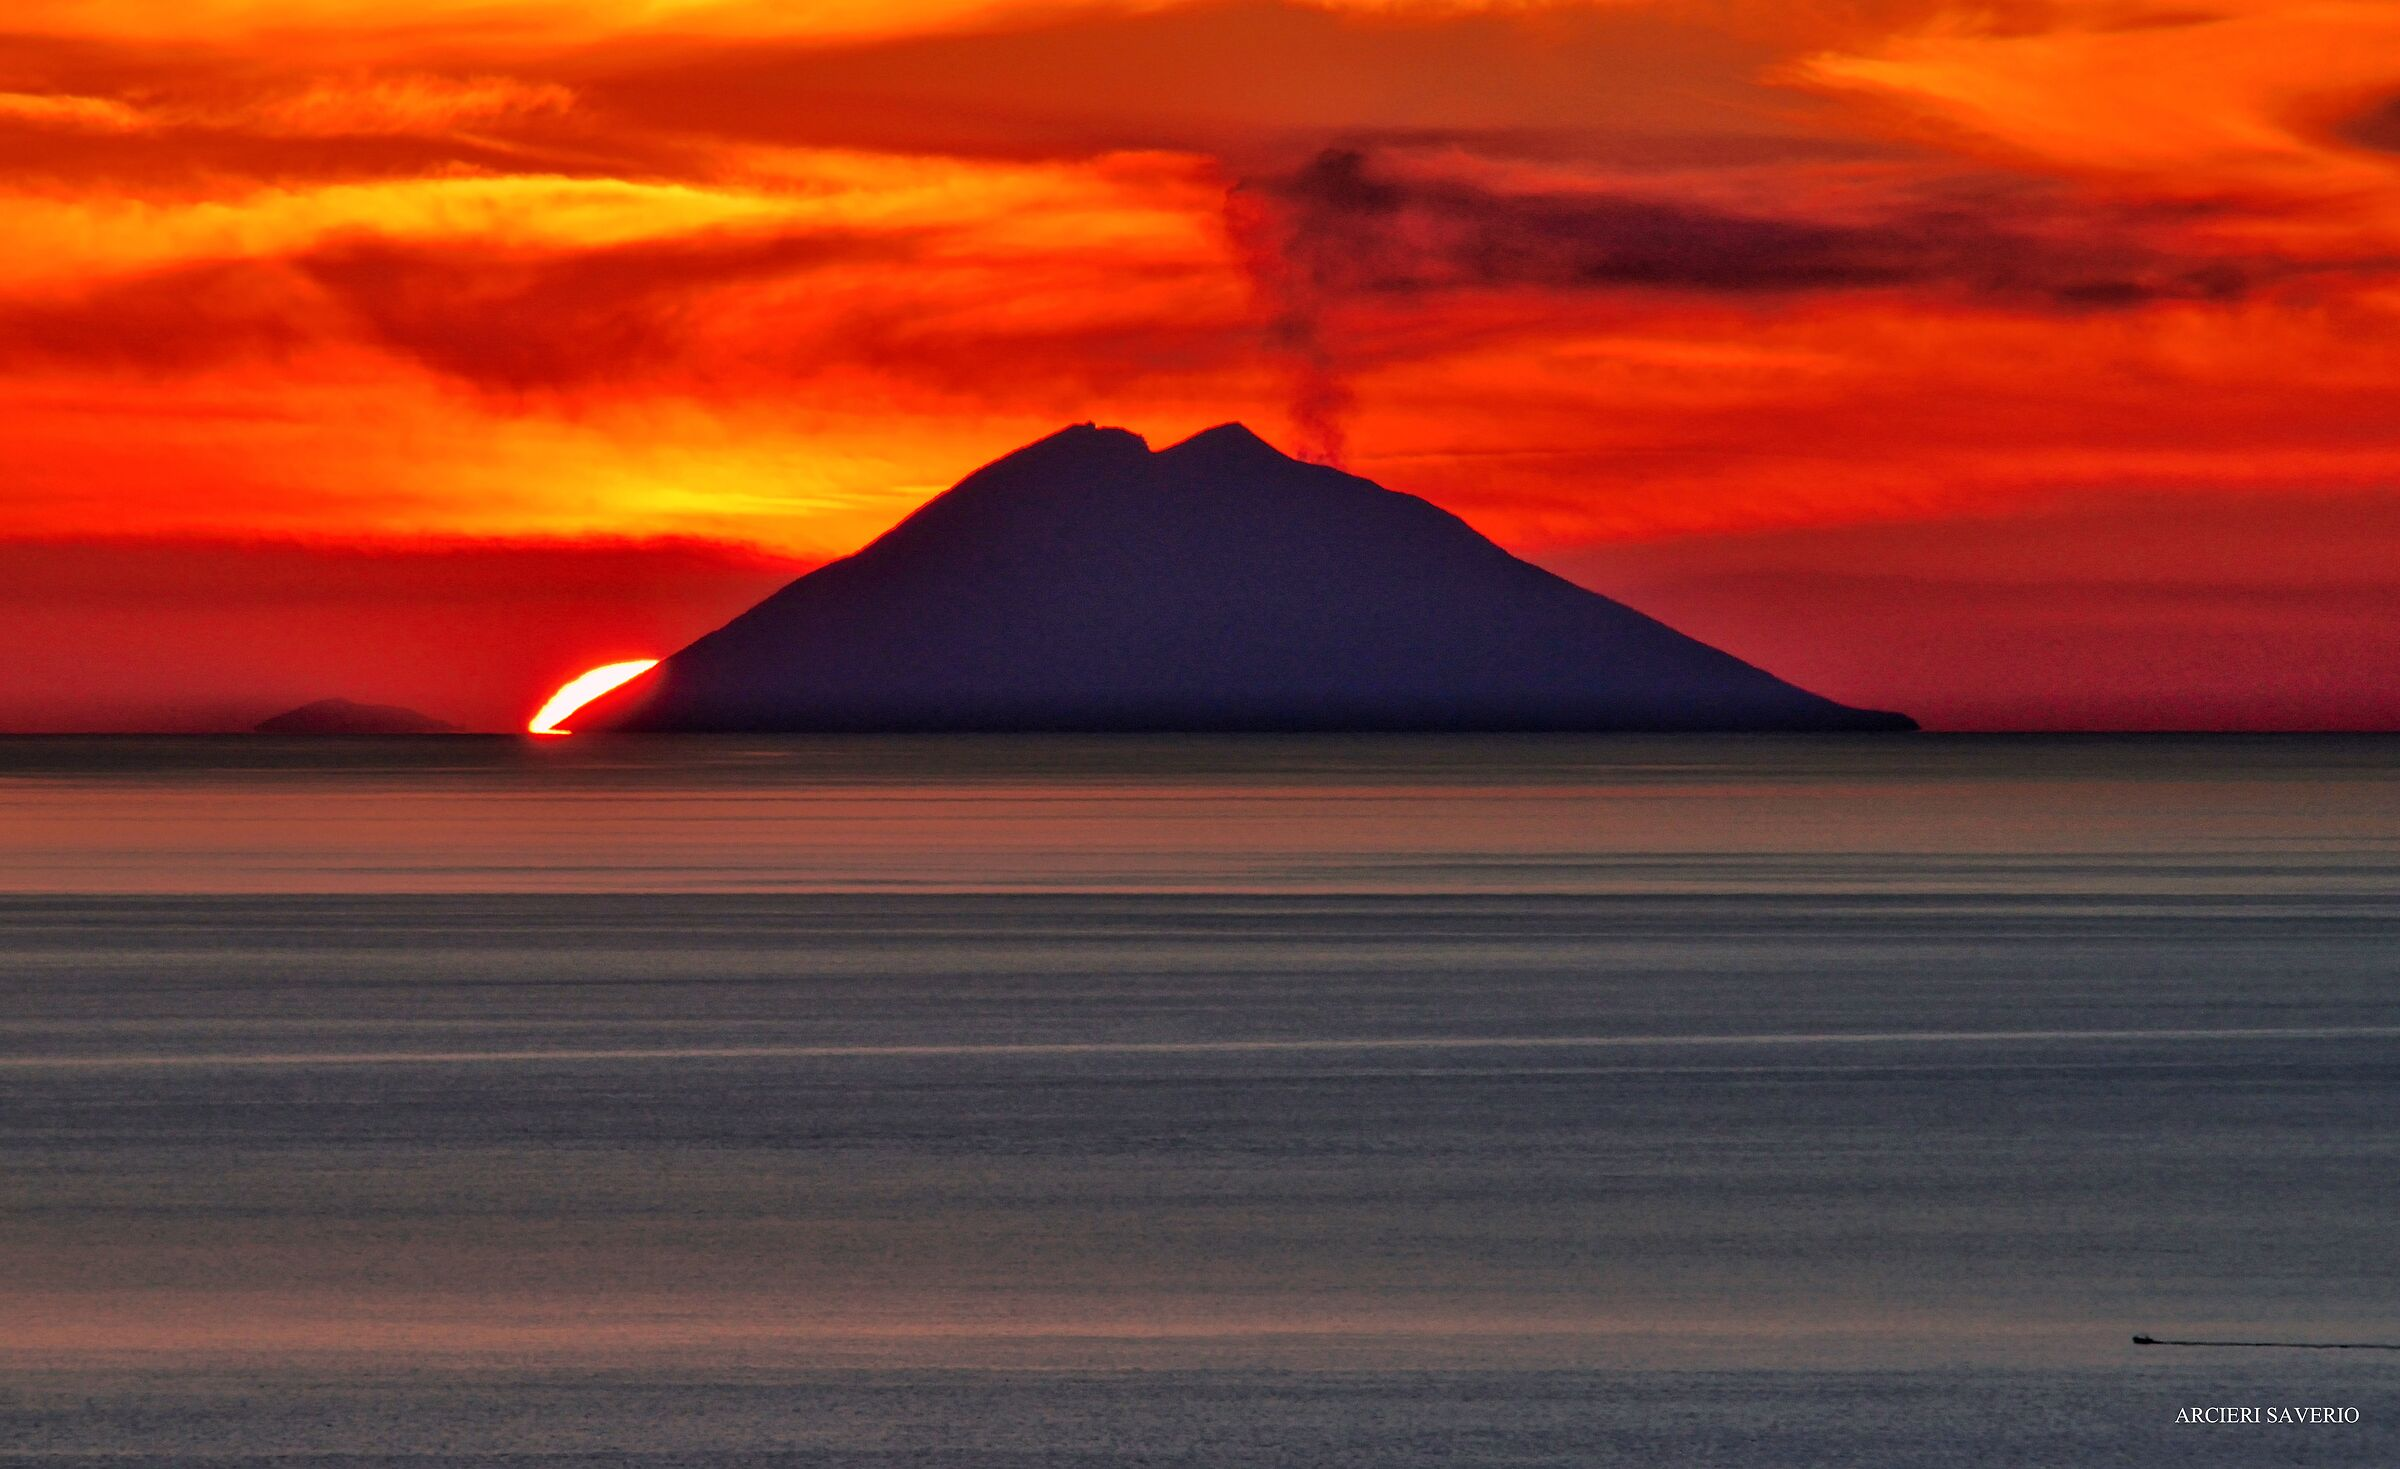 The Kiss of the Sun (The Stromboli) ...